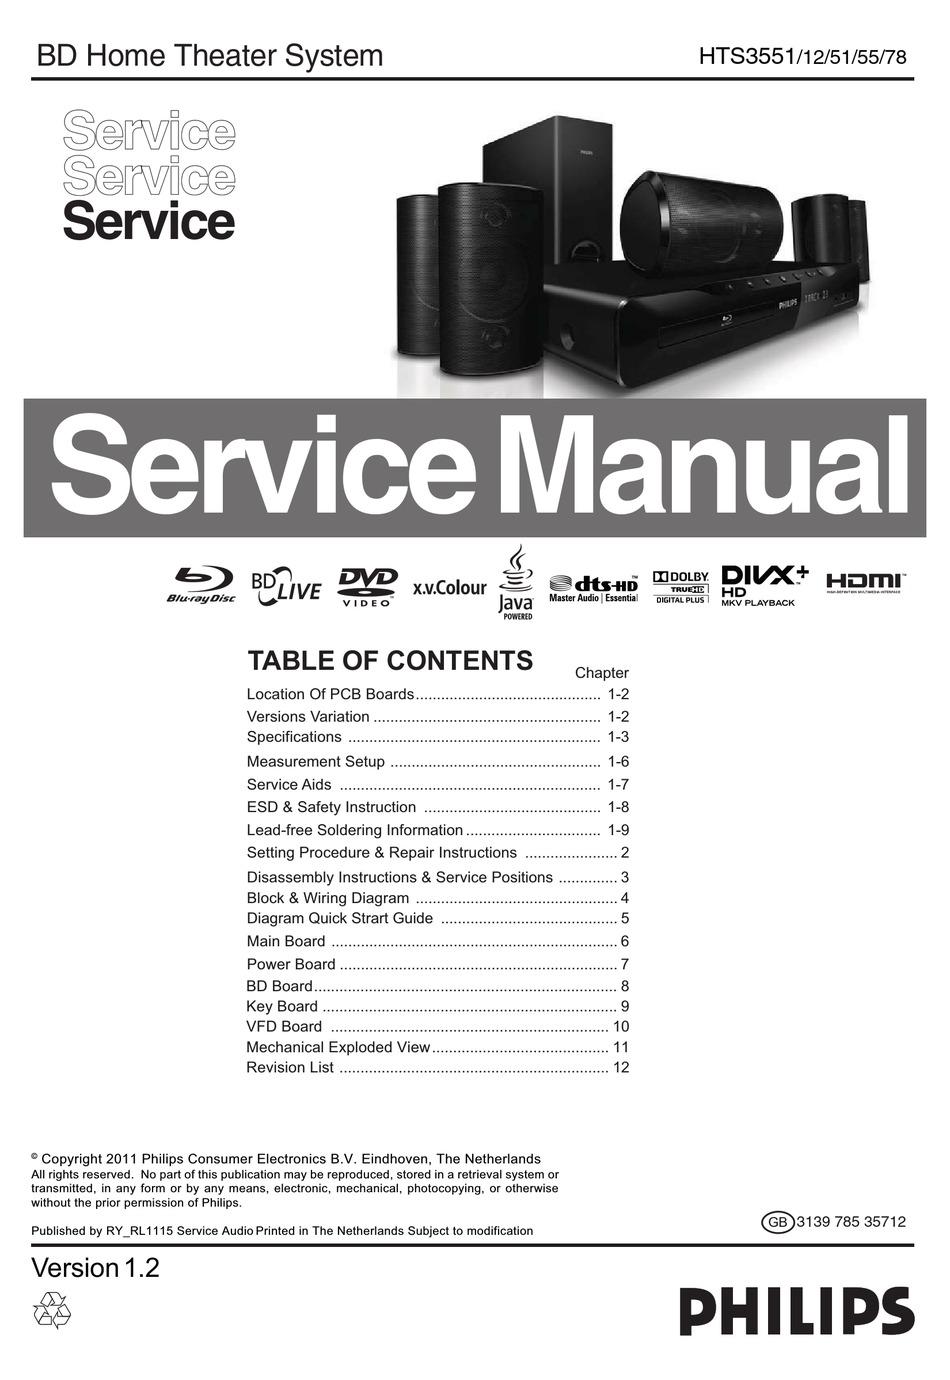 PHILIPS HTS3551 SERVICE MANUAL Pdf Download | ManualsLib